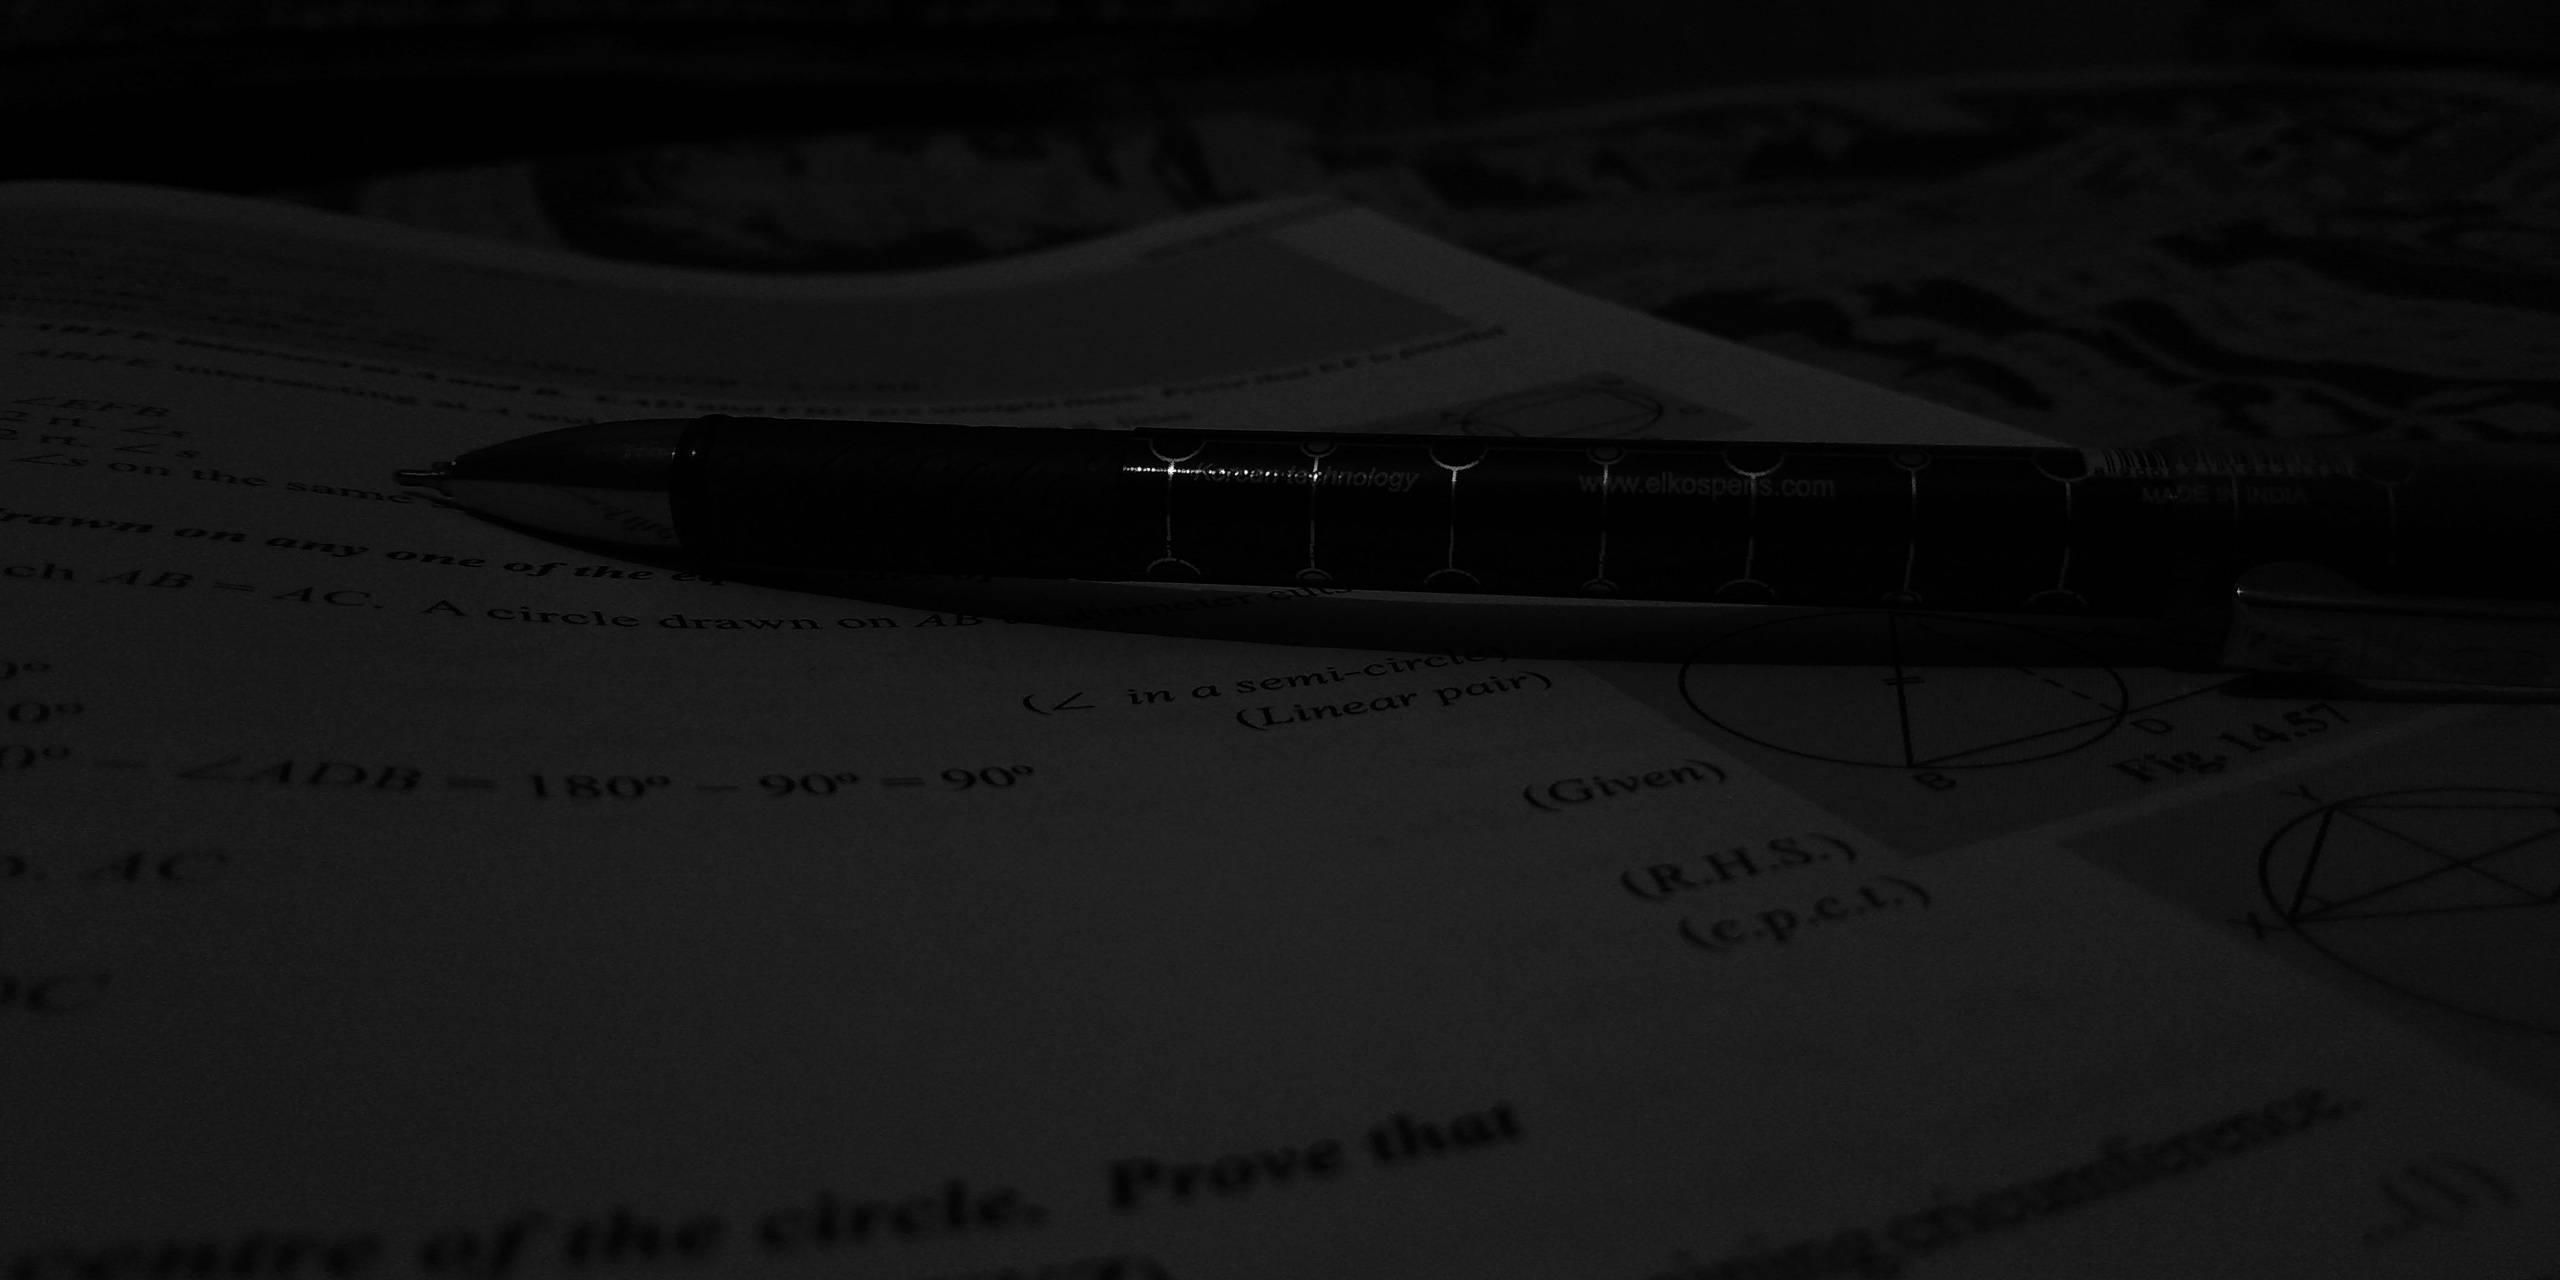 FREE STUDY TIME